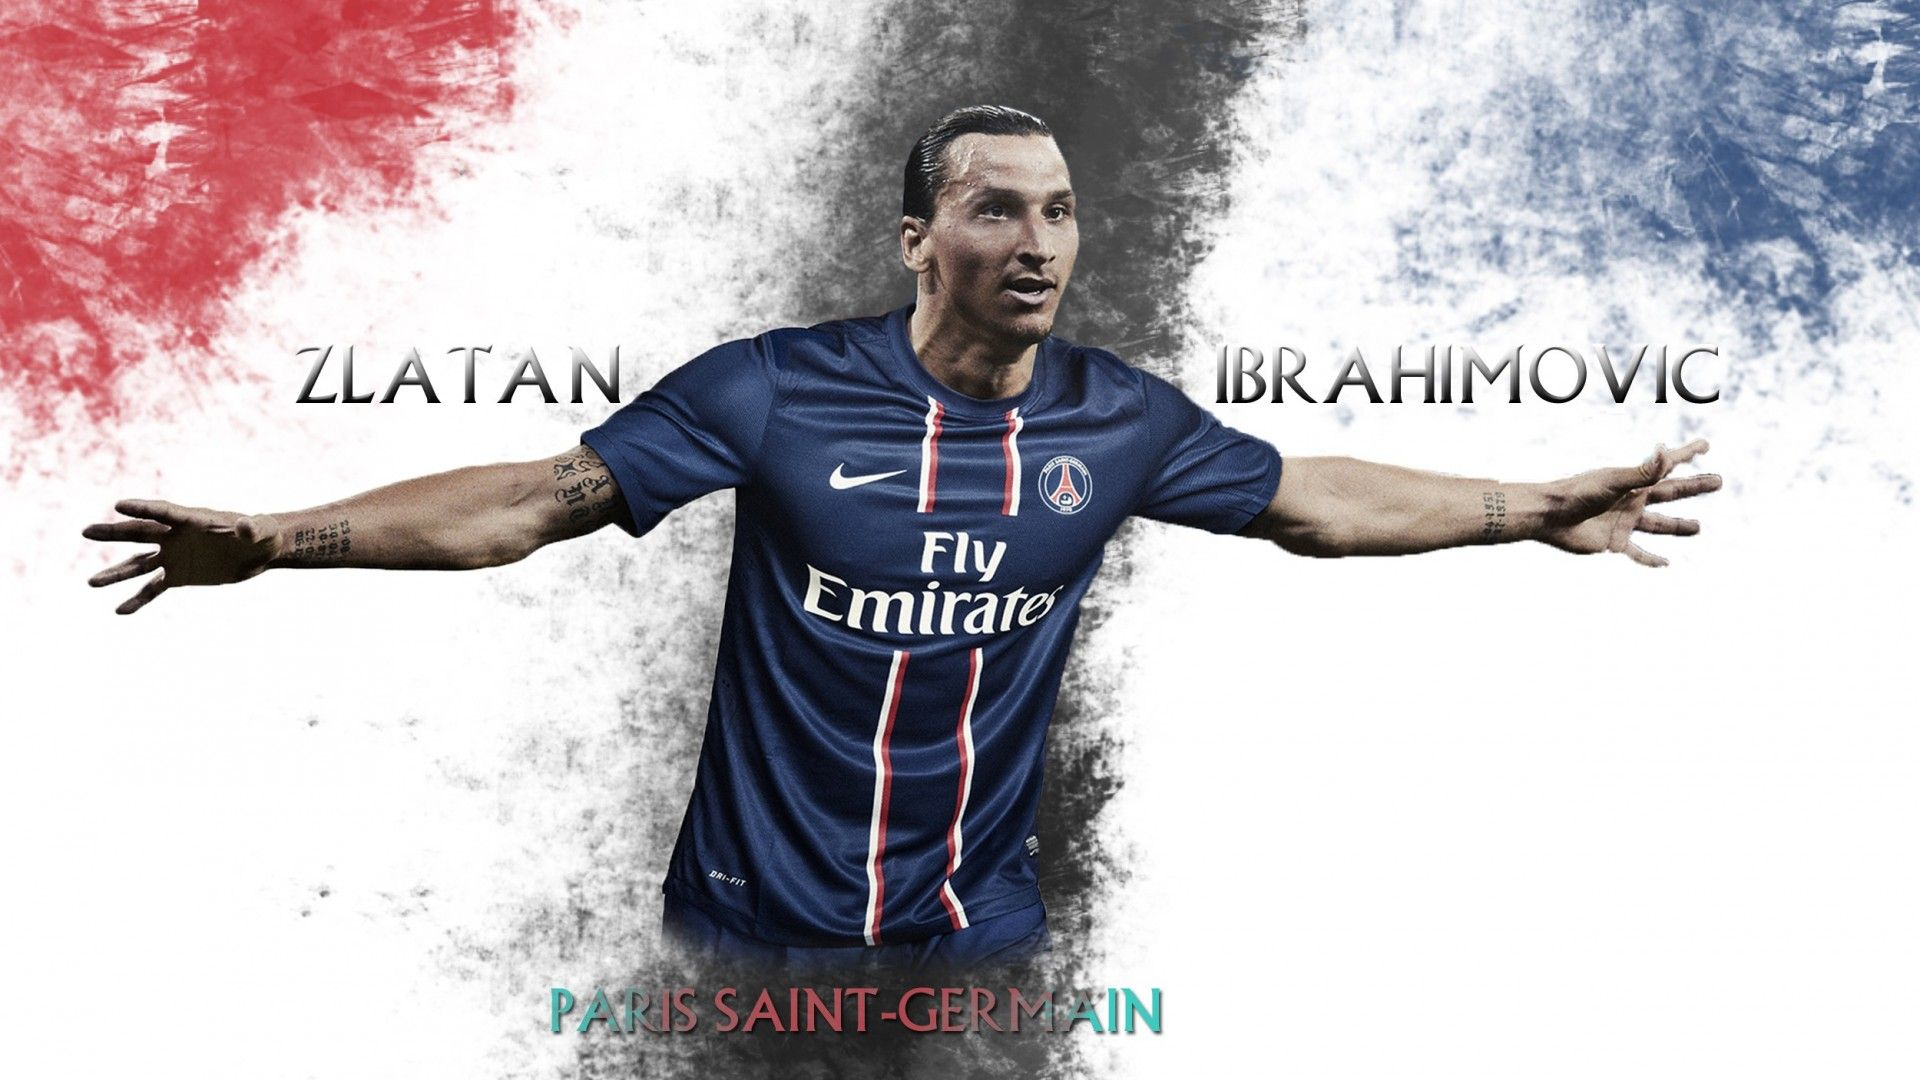 zlatan ibrahimovic paris saint german hd picture Football 1920x1080